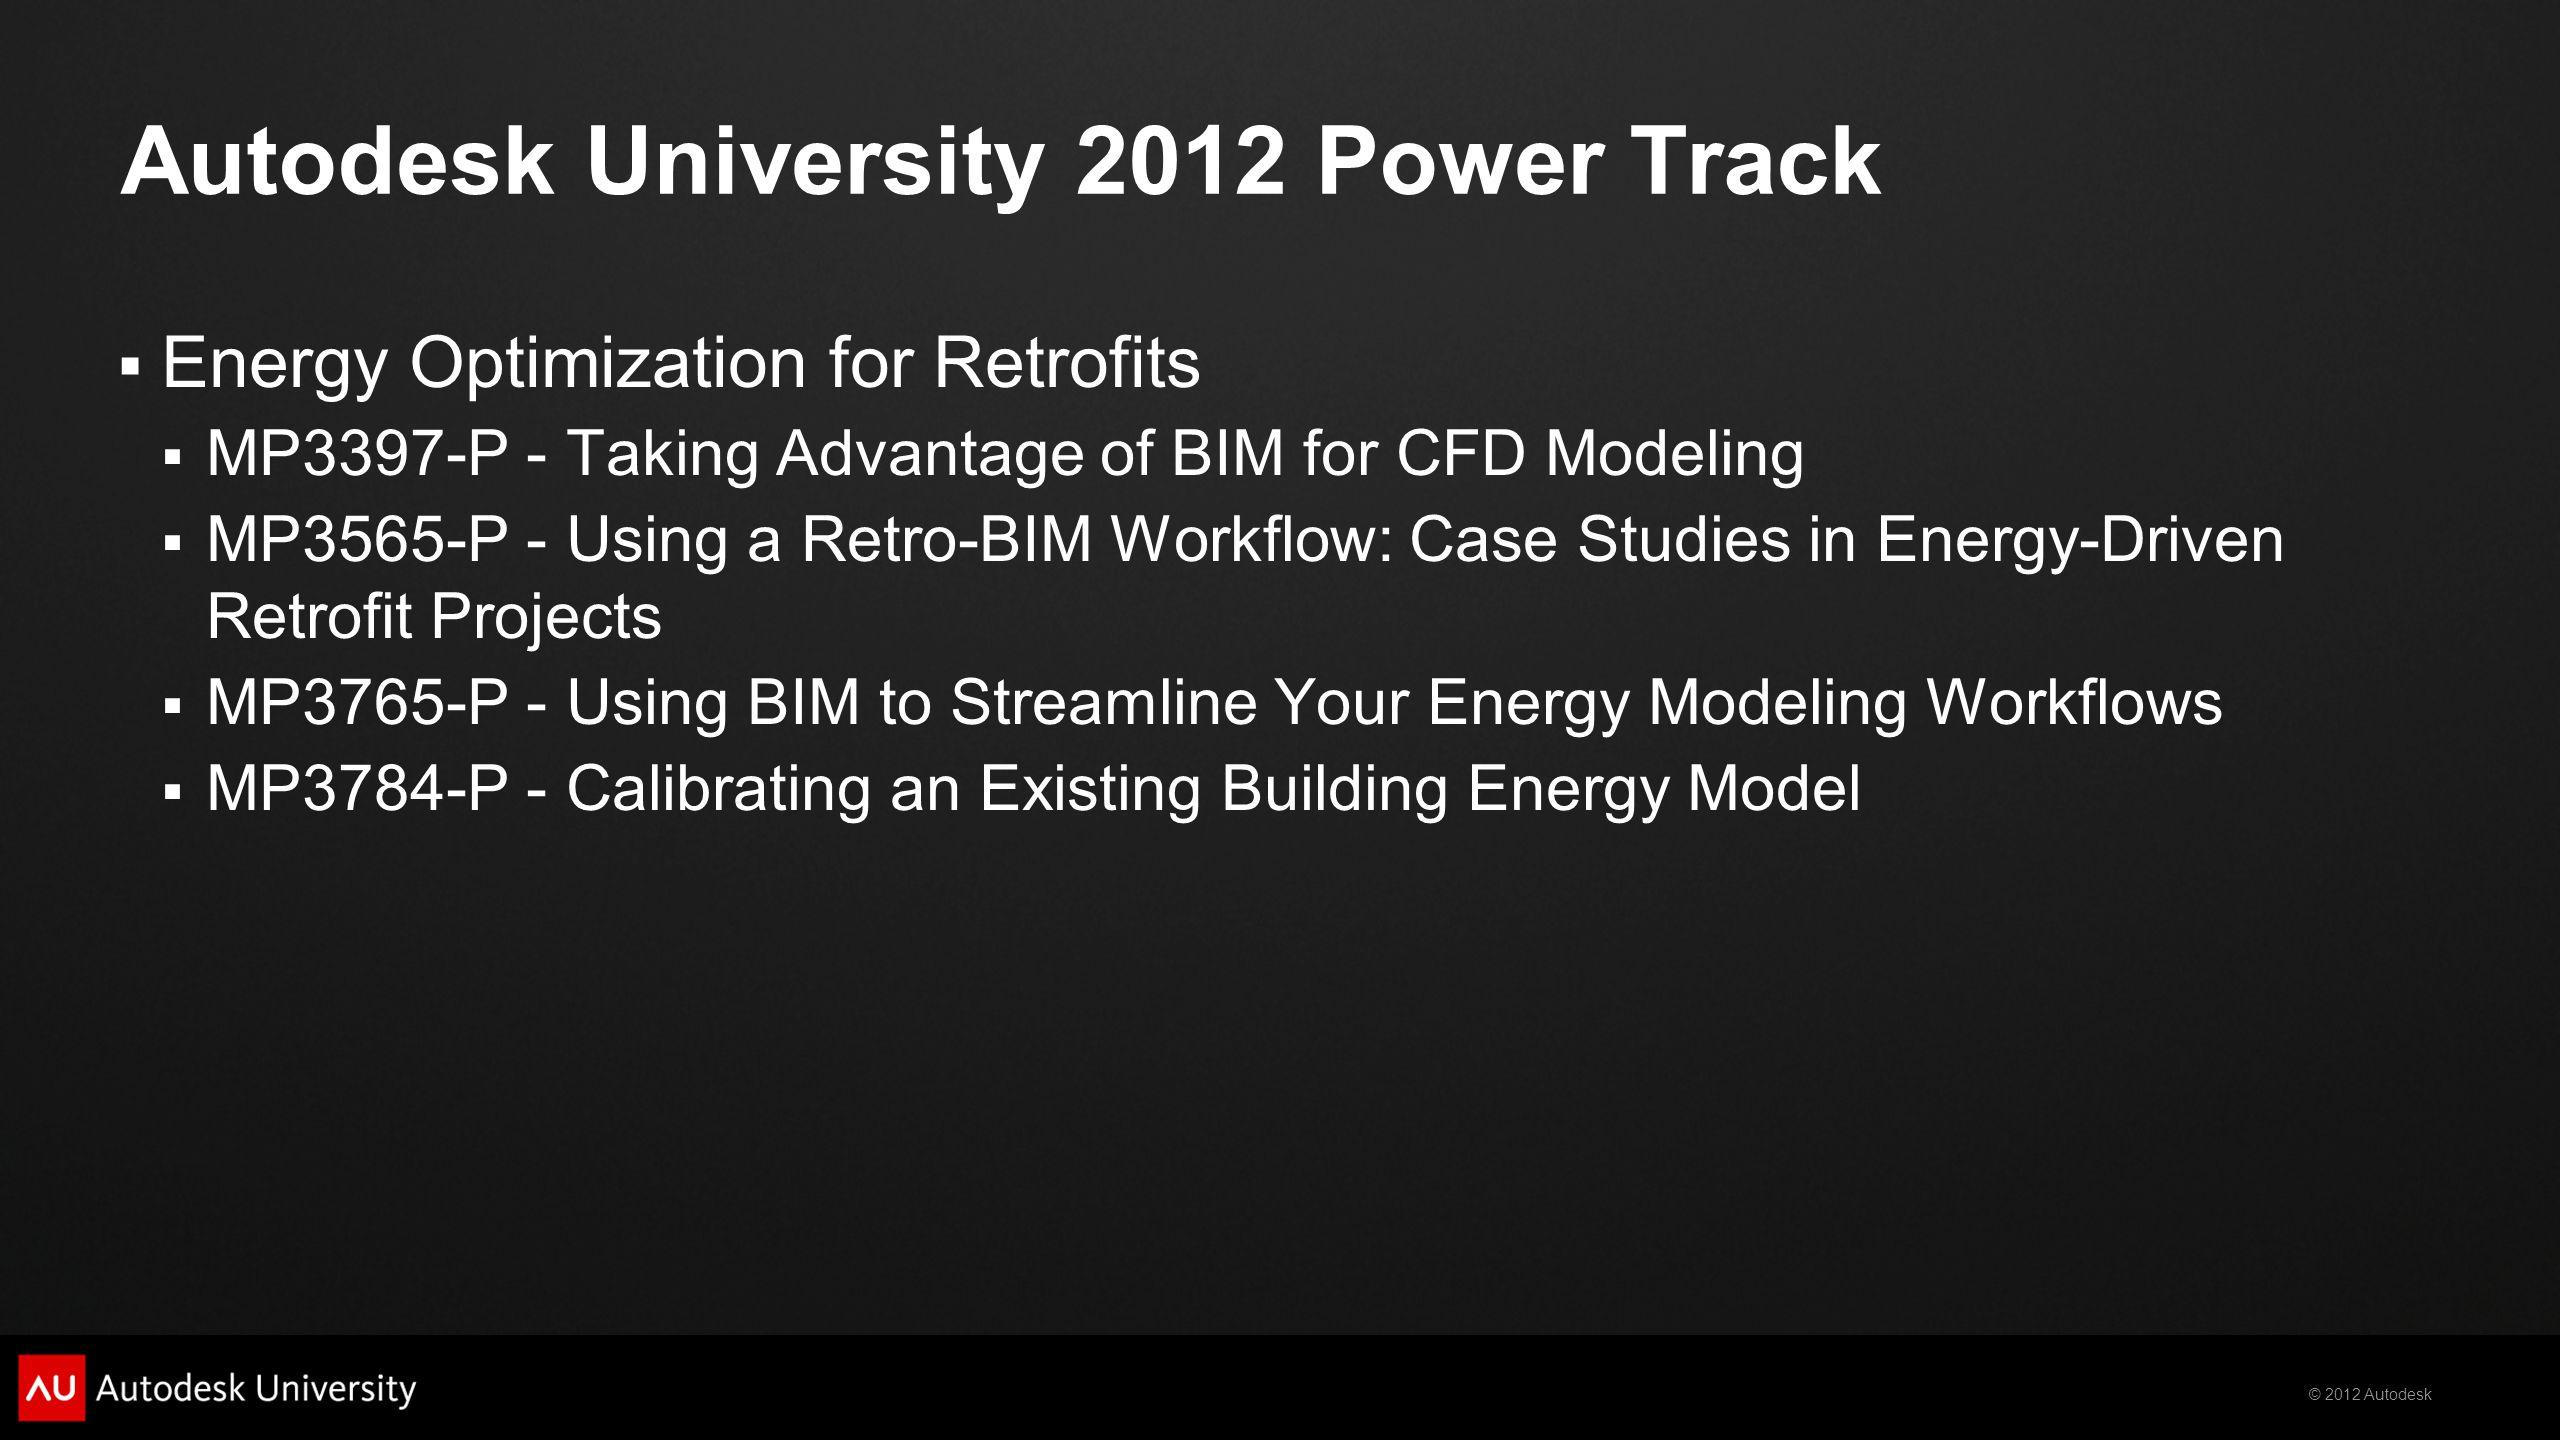 Autodesk University 2012 Power Track